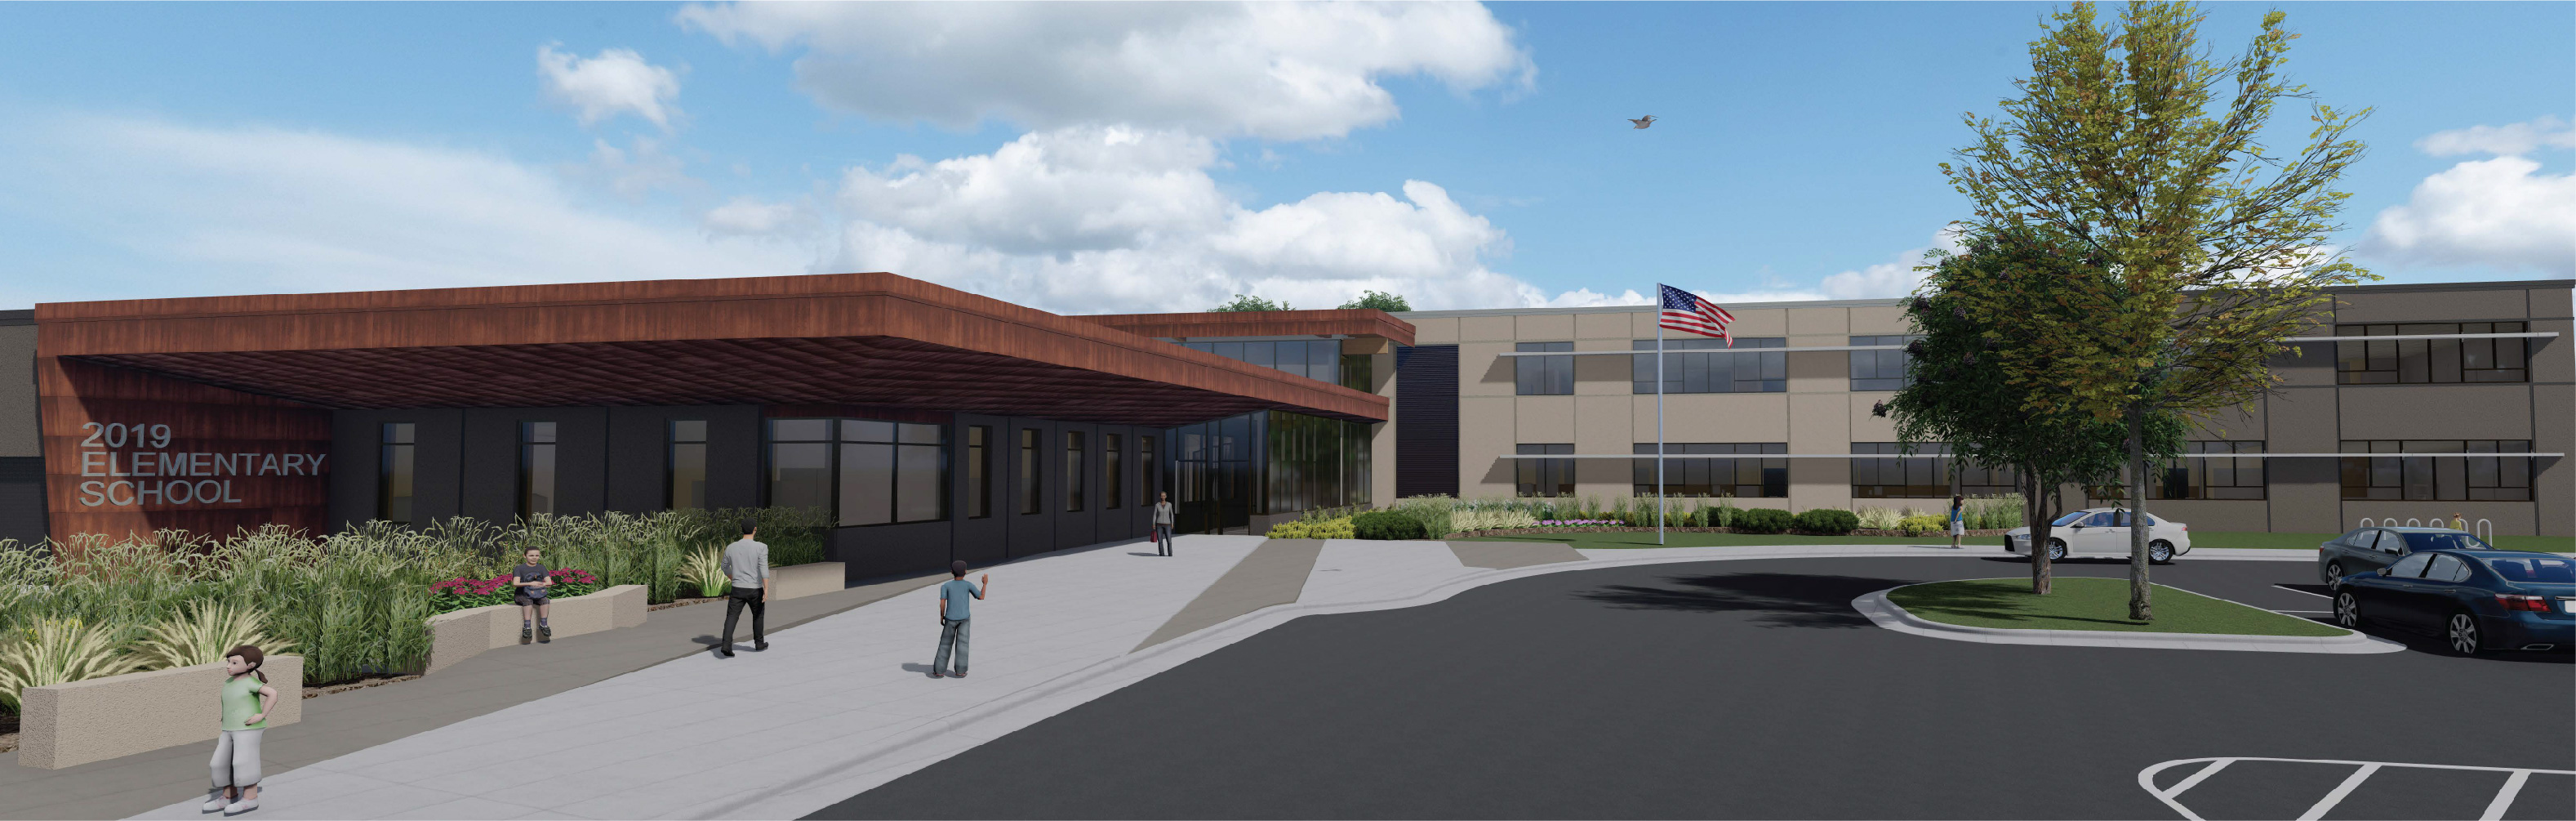 Rendering of the NW Elementary School